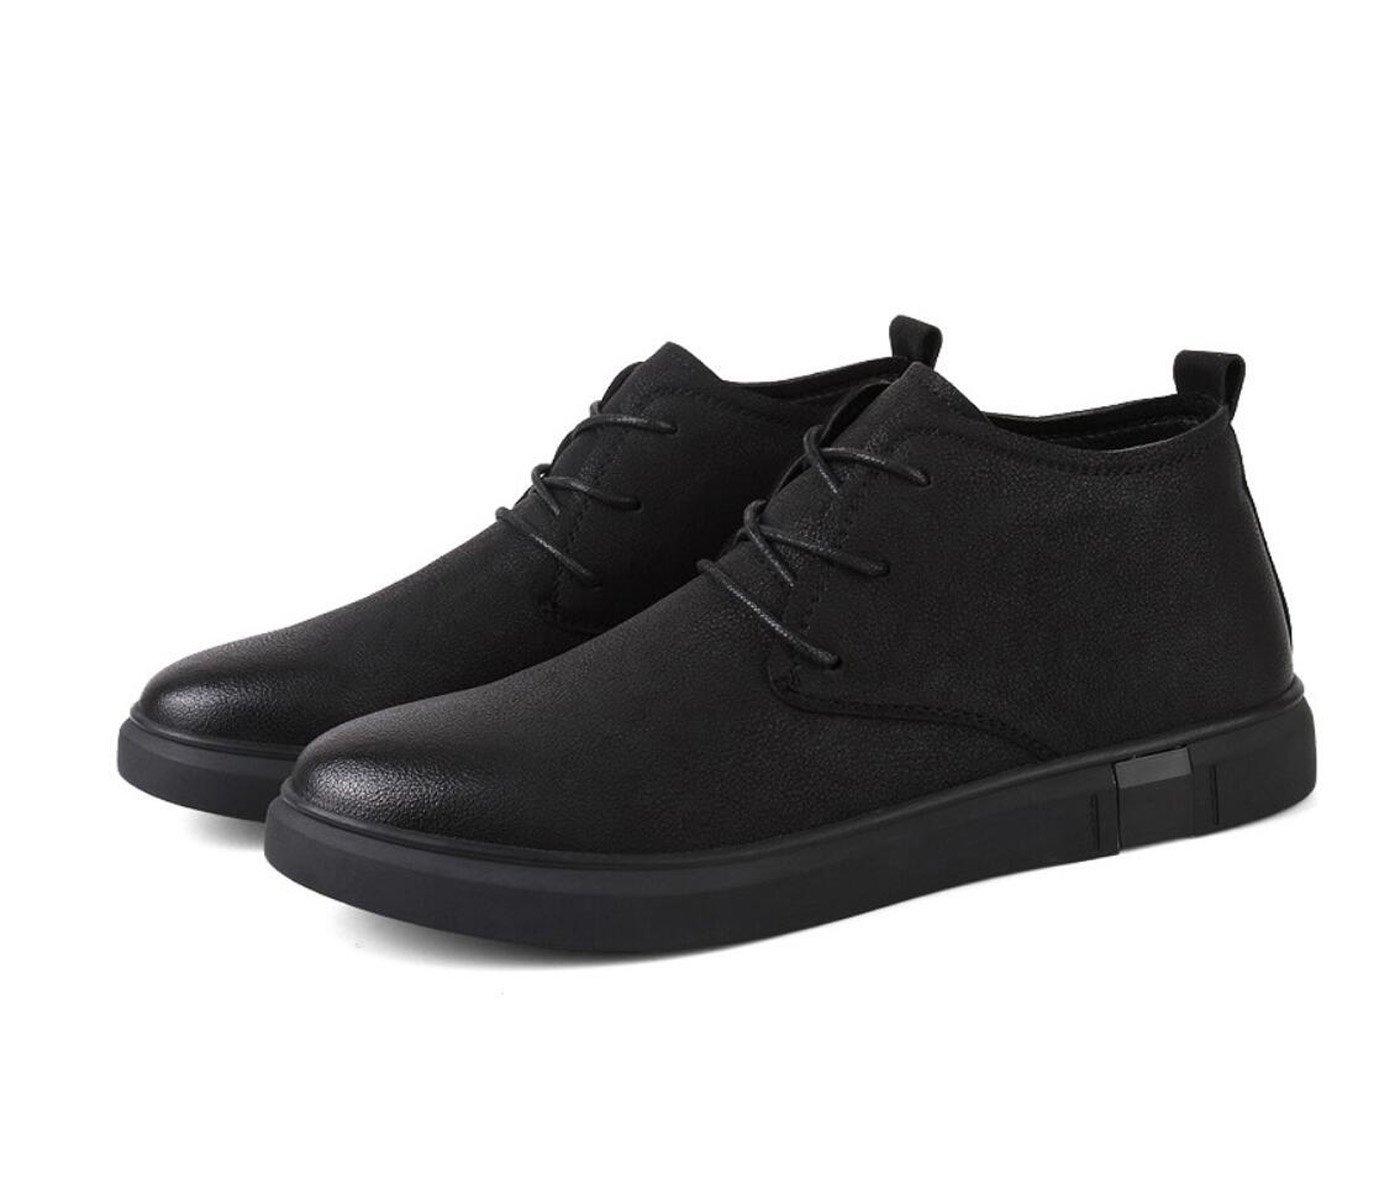 DANDANJIE Herrenschuhe Schuhe Warme Samt Baumwoll Schuhe Herrenschuhe 2018 Herbst-und Winter Modelle Handgemachte Lässige Lederstiefel a22601